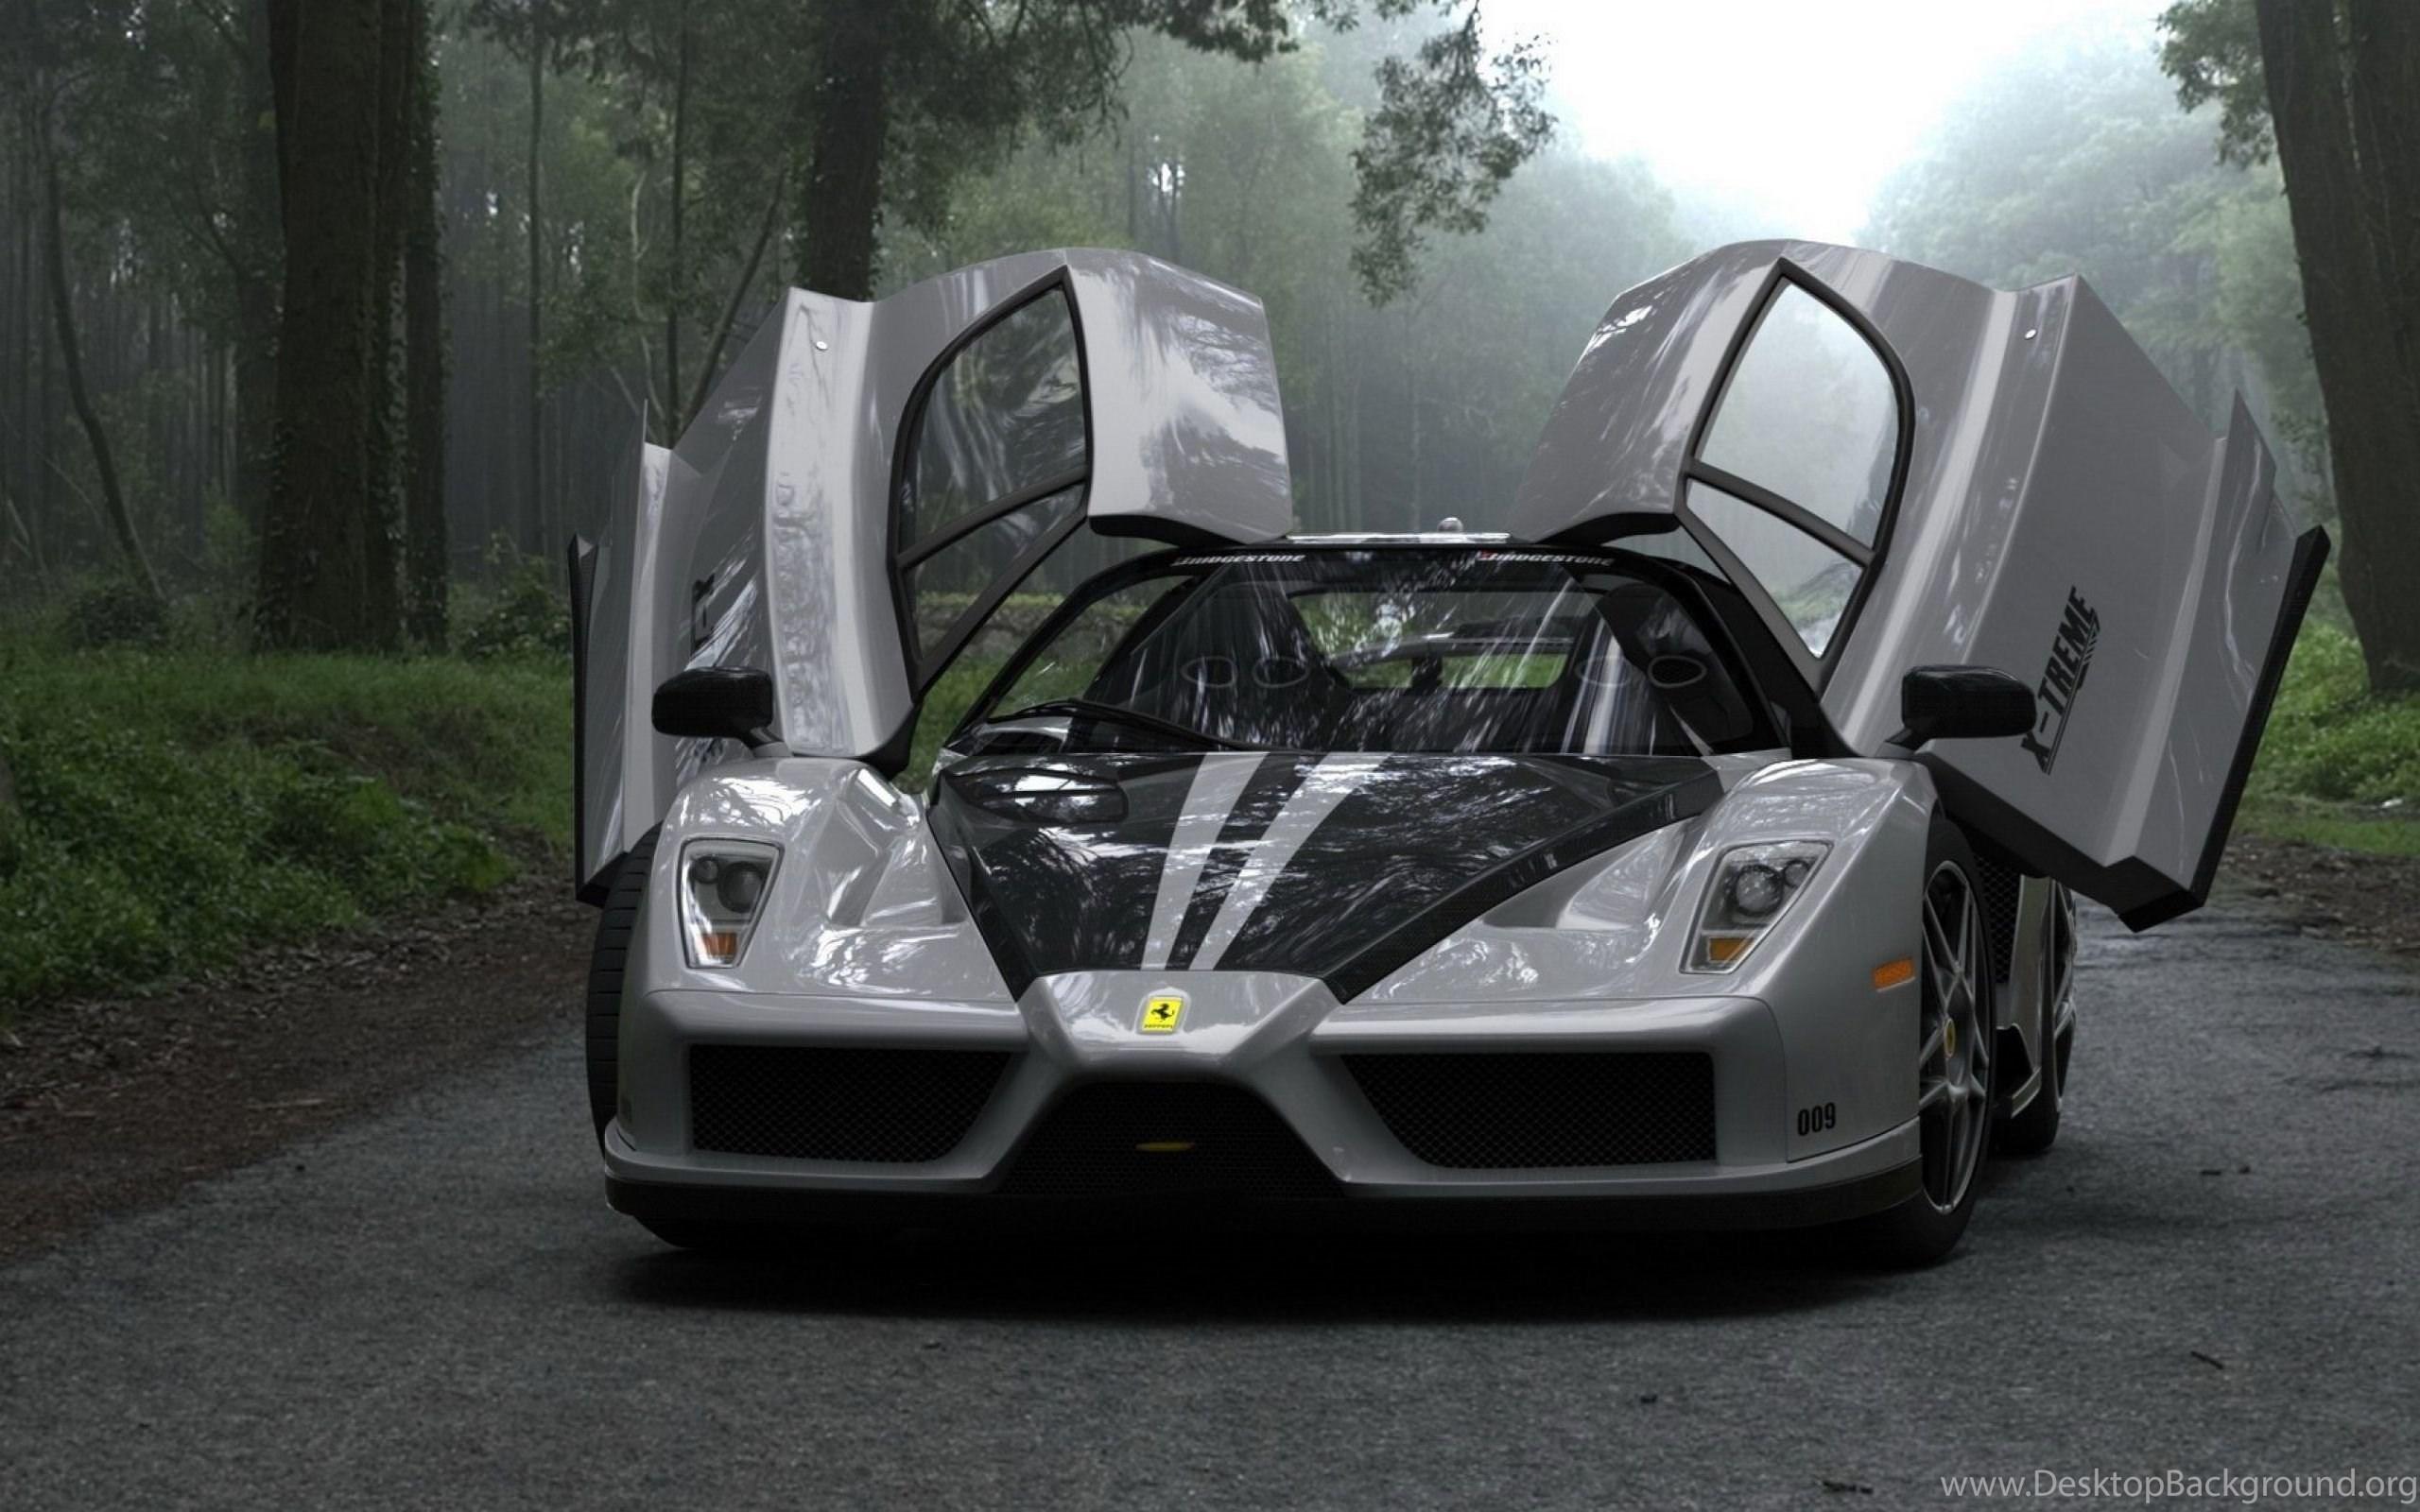 Wallpapers Mobil Ferari Size More Ferrari In Usa Hd X Animal